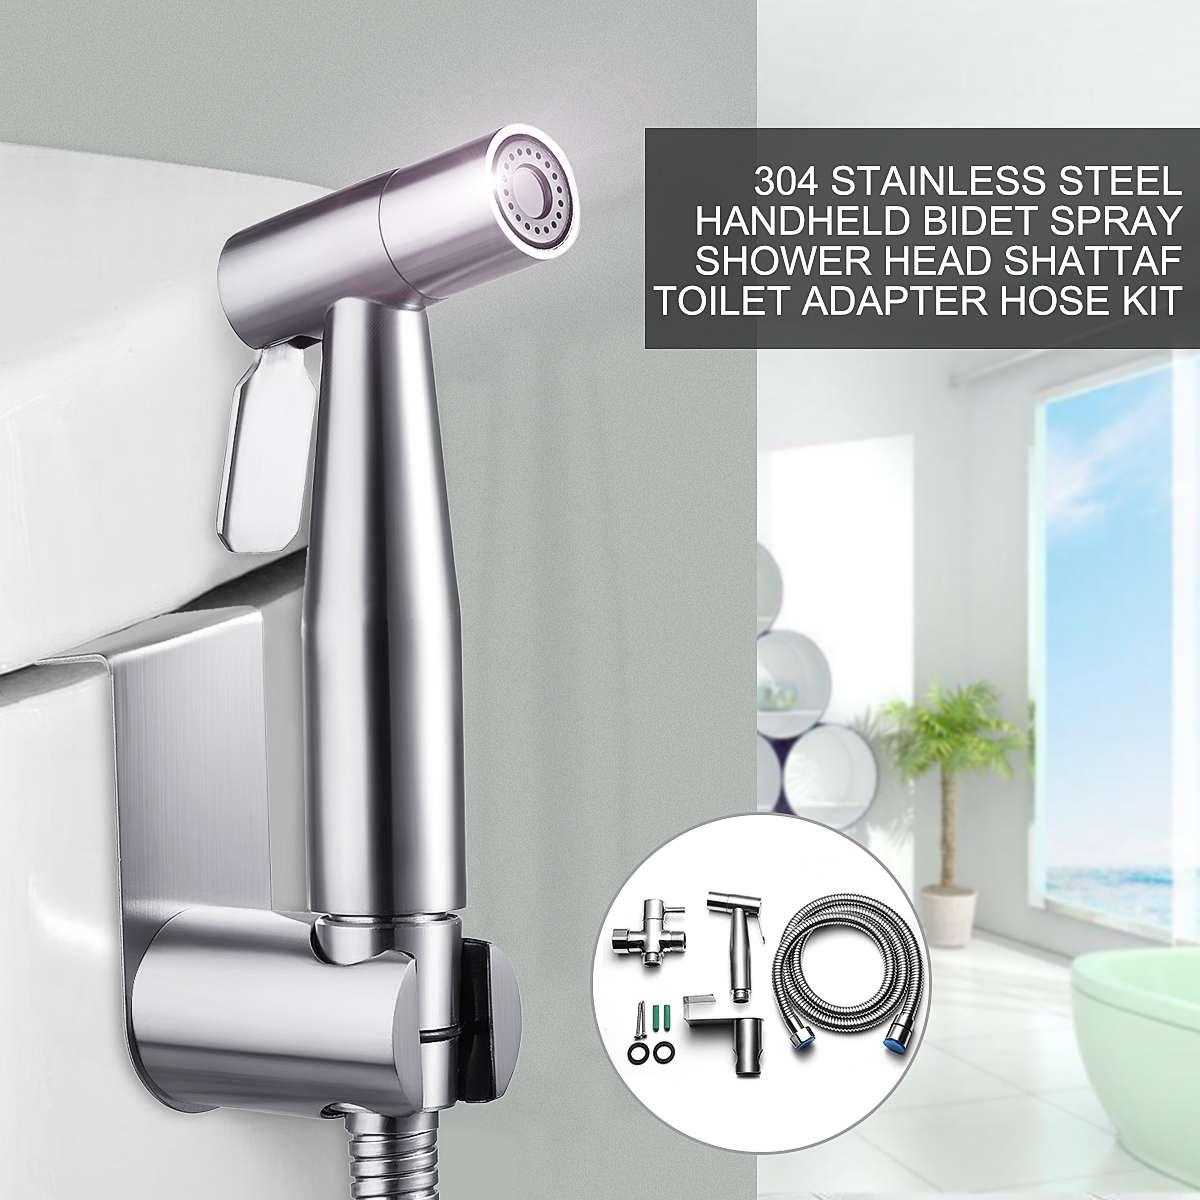 Bidets & Bidet Parts Bathroom Fixtures Gappo Bidets Handheld Shower Bathroom Bidet Spray Muslim Shower Toilet Faucet Washer Tap Mixers Ducha Higienica Shrink-Proof